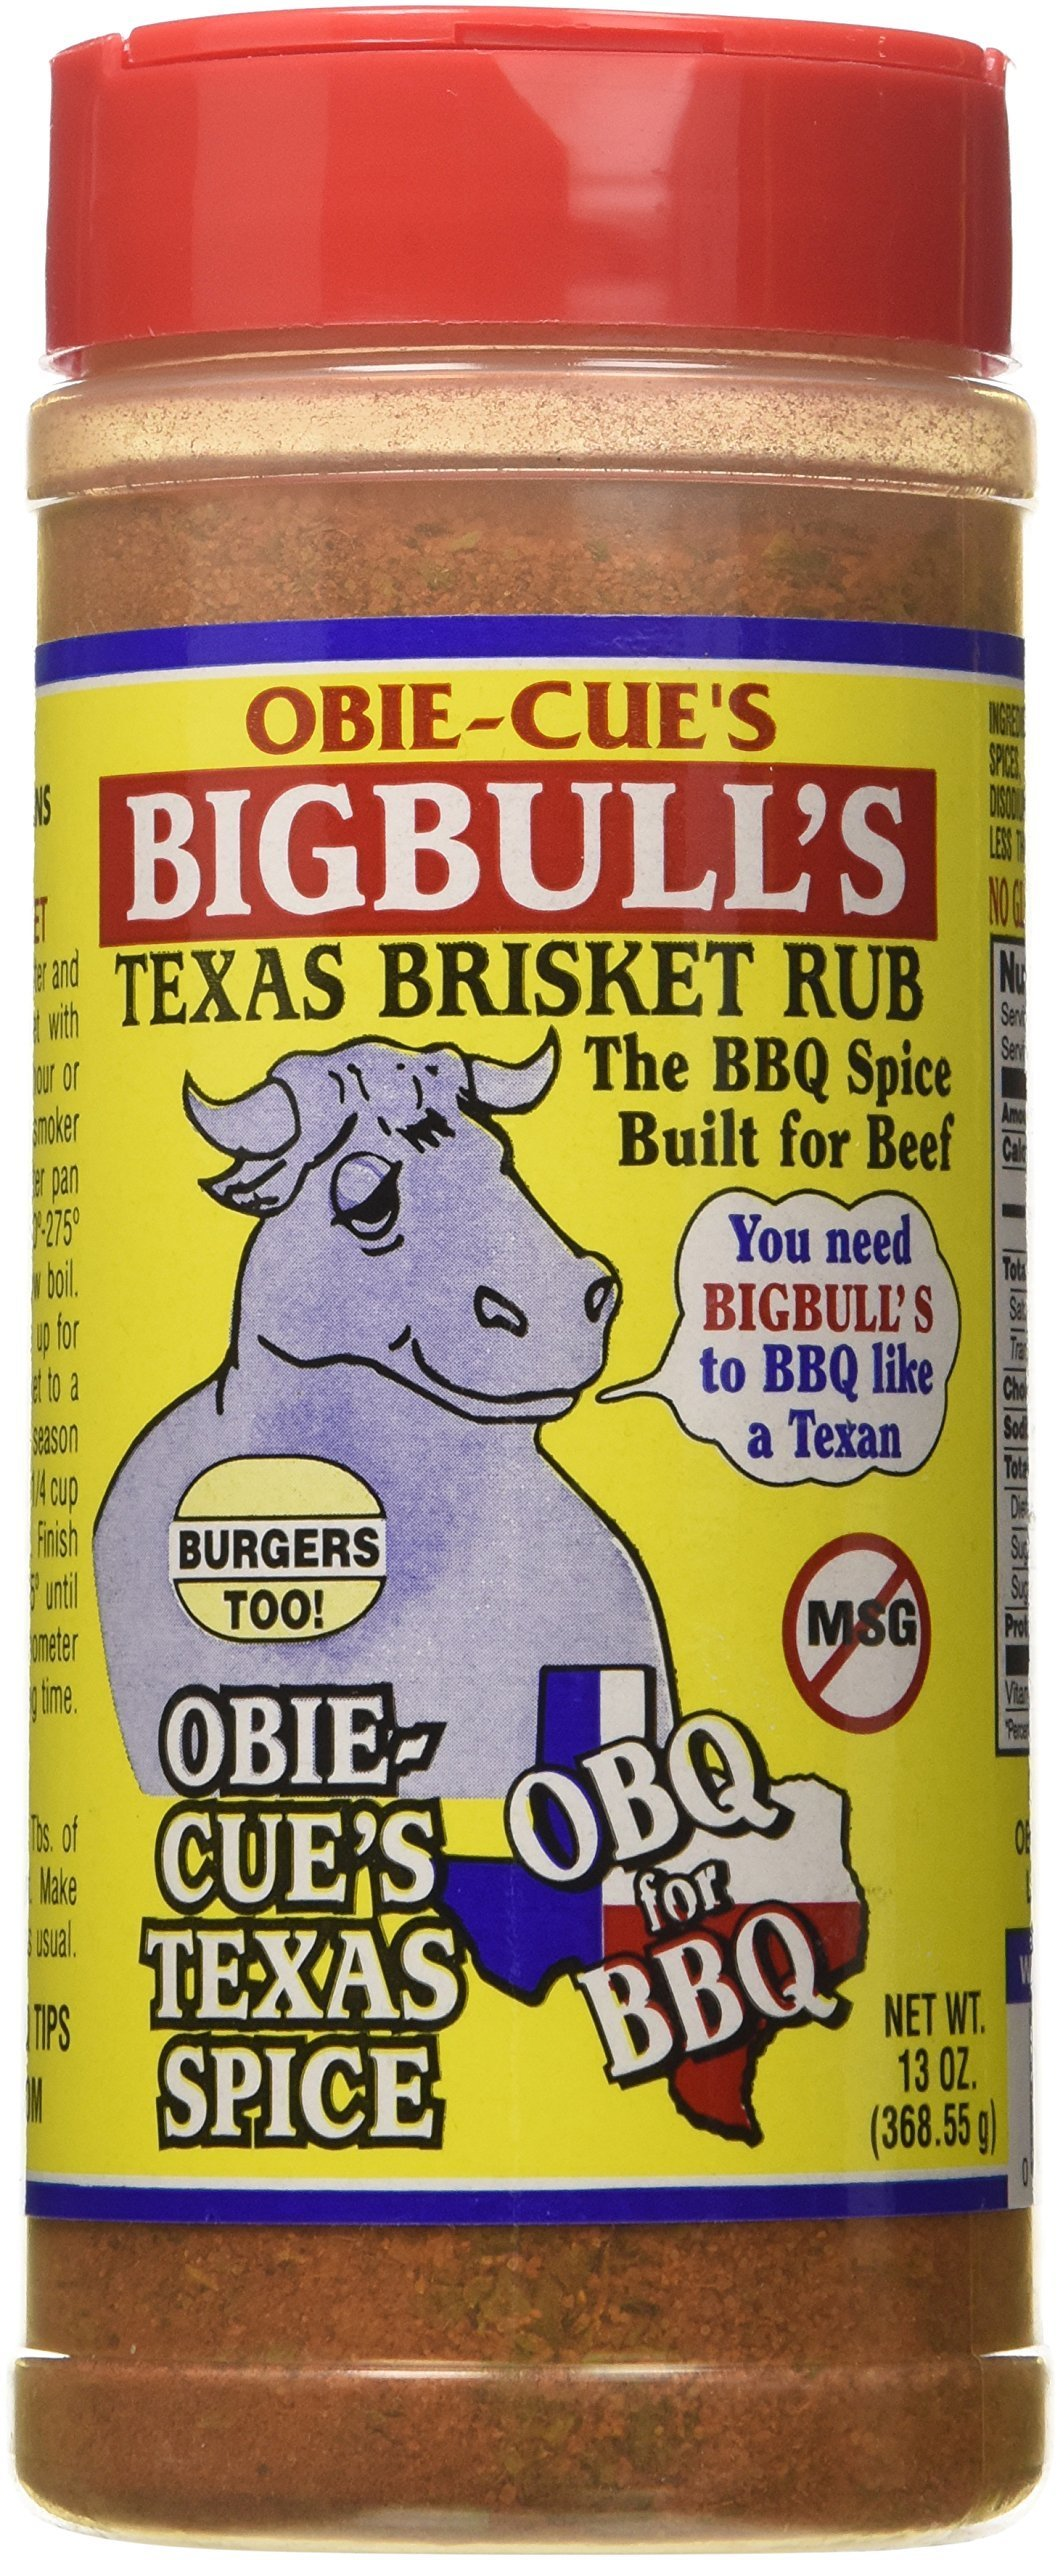 Obie-Cue's Big Bull Brisket Rub 0022702999116